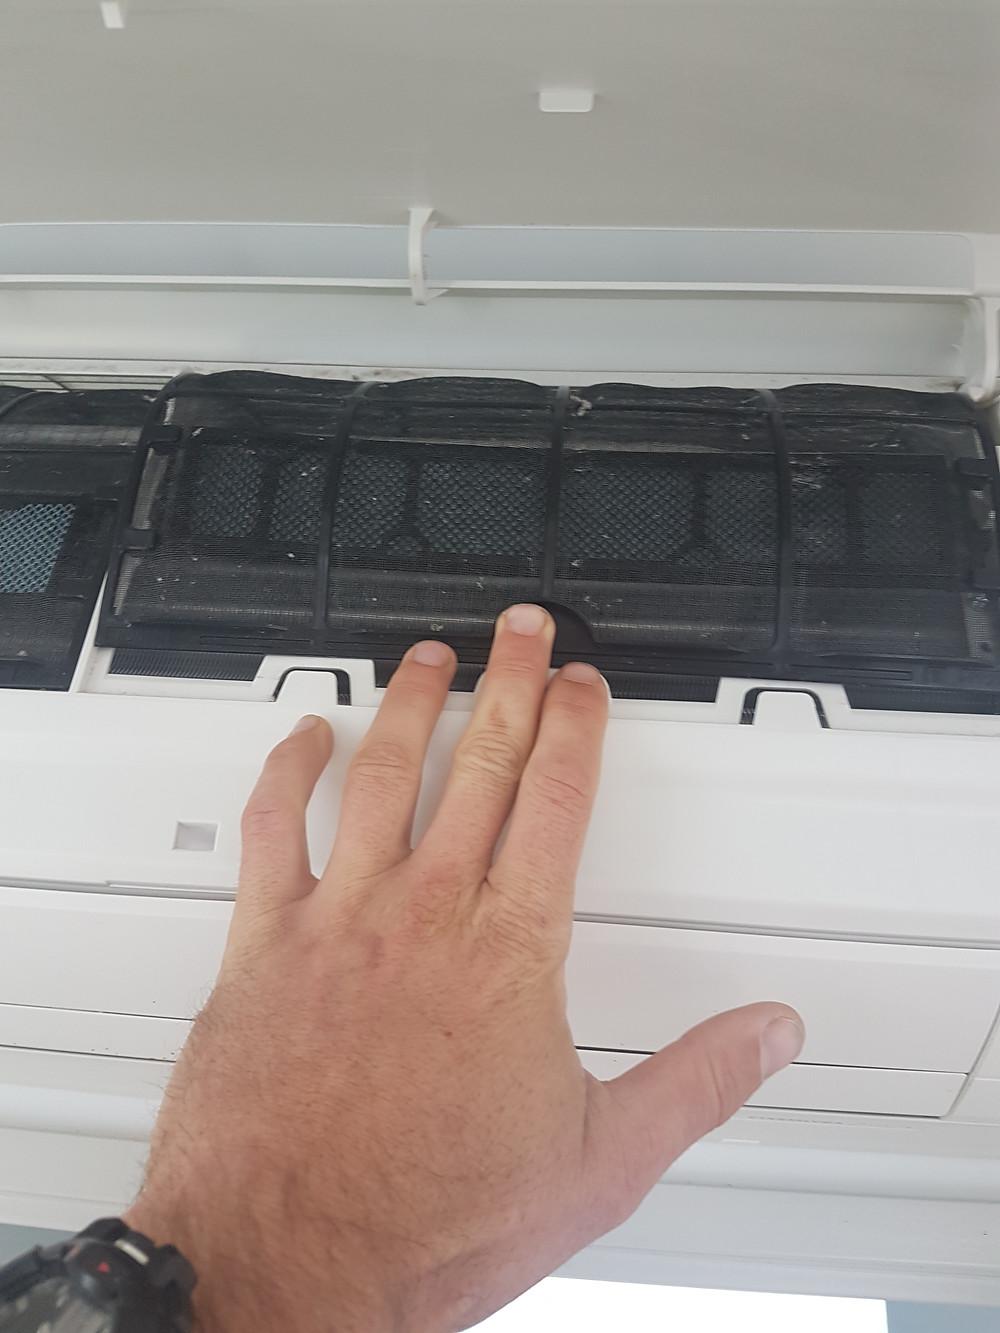 Wakatipu Heating Refrigeration-Change heatpump filter-remove filter